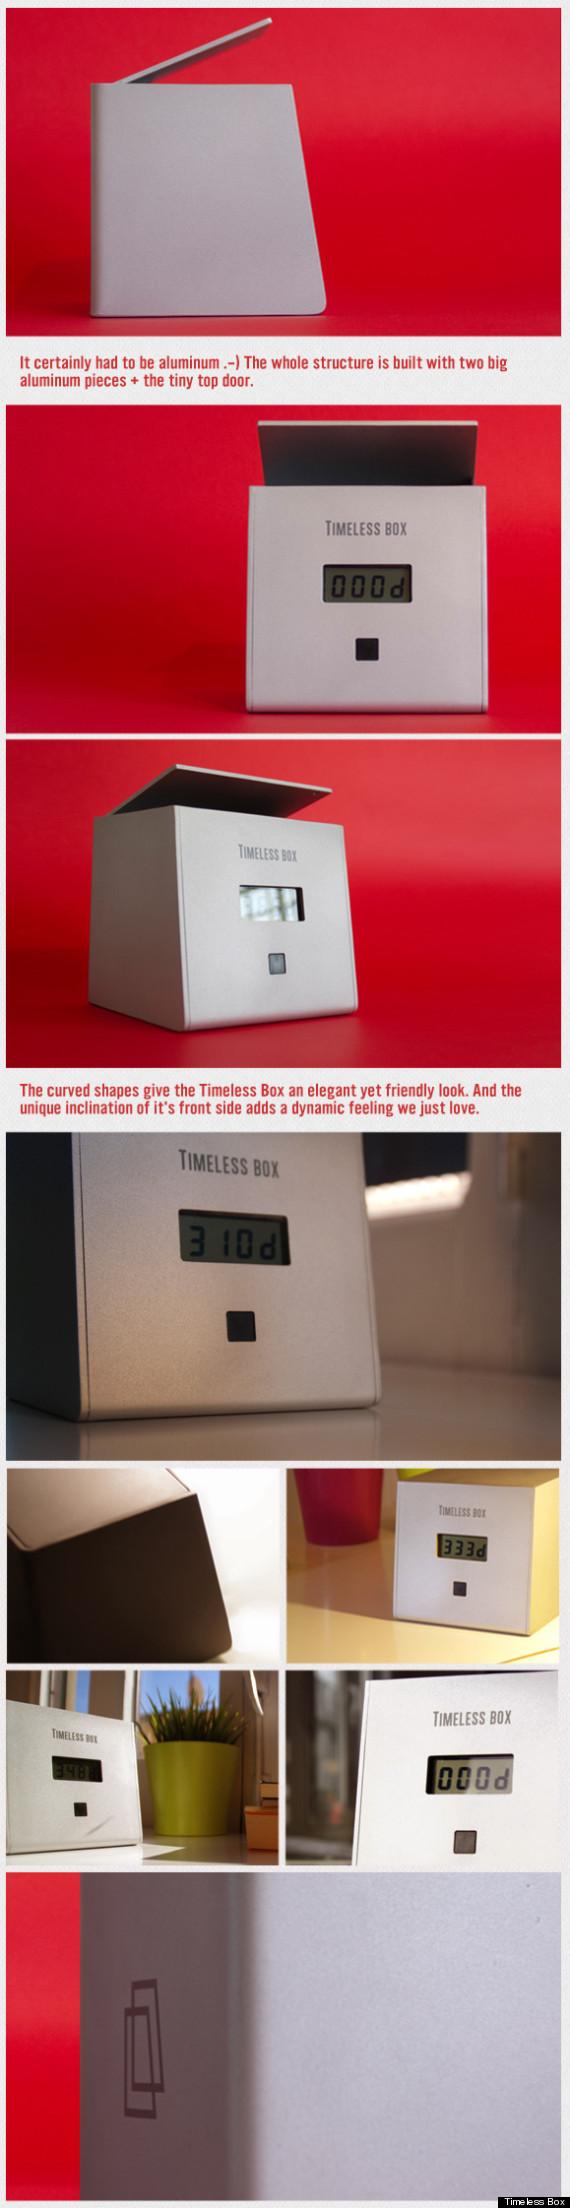 timeless box